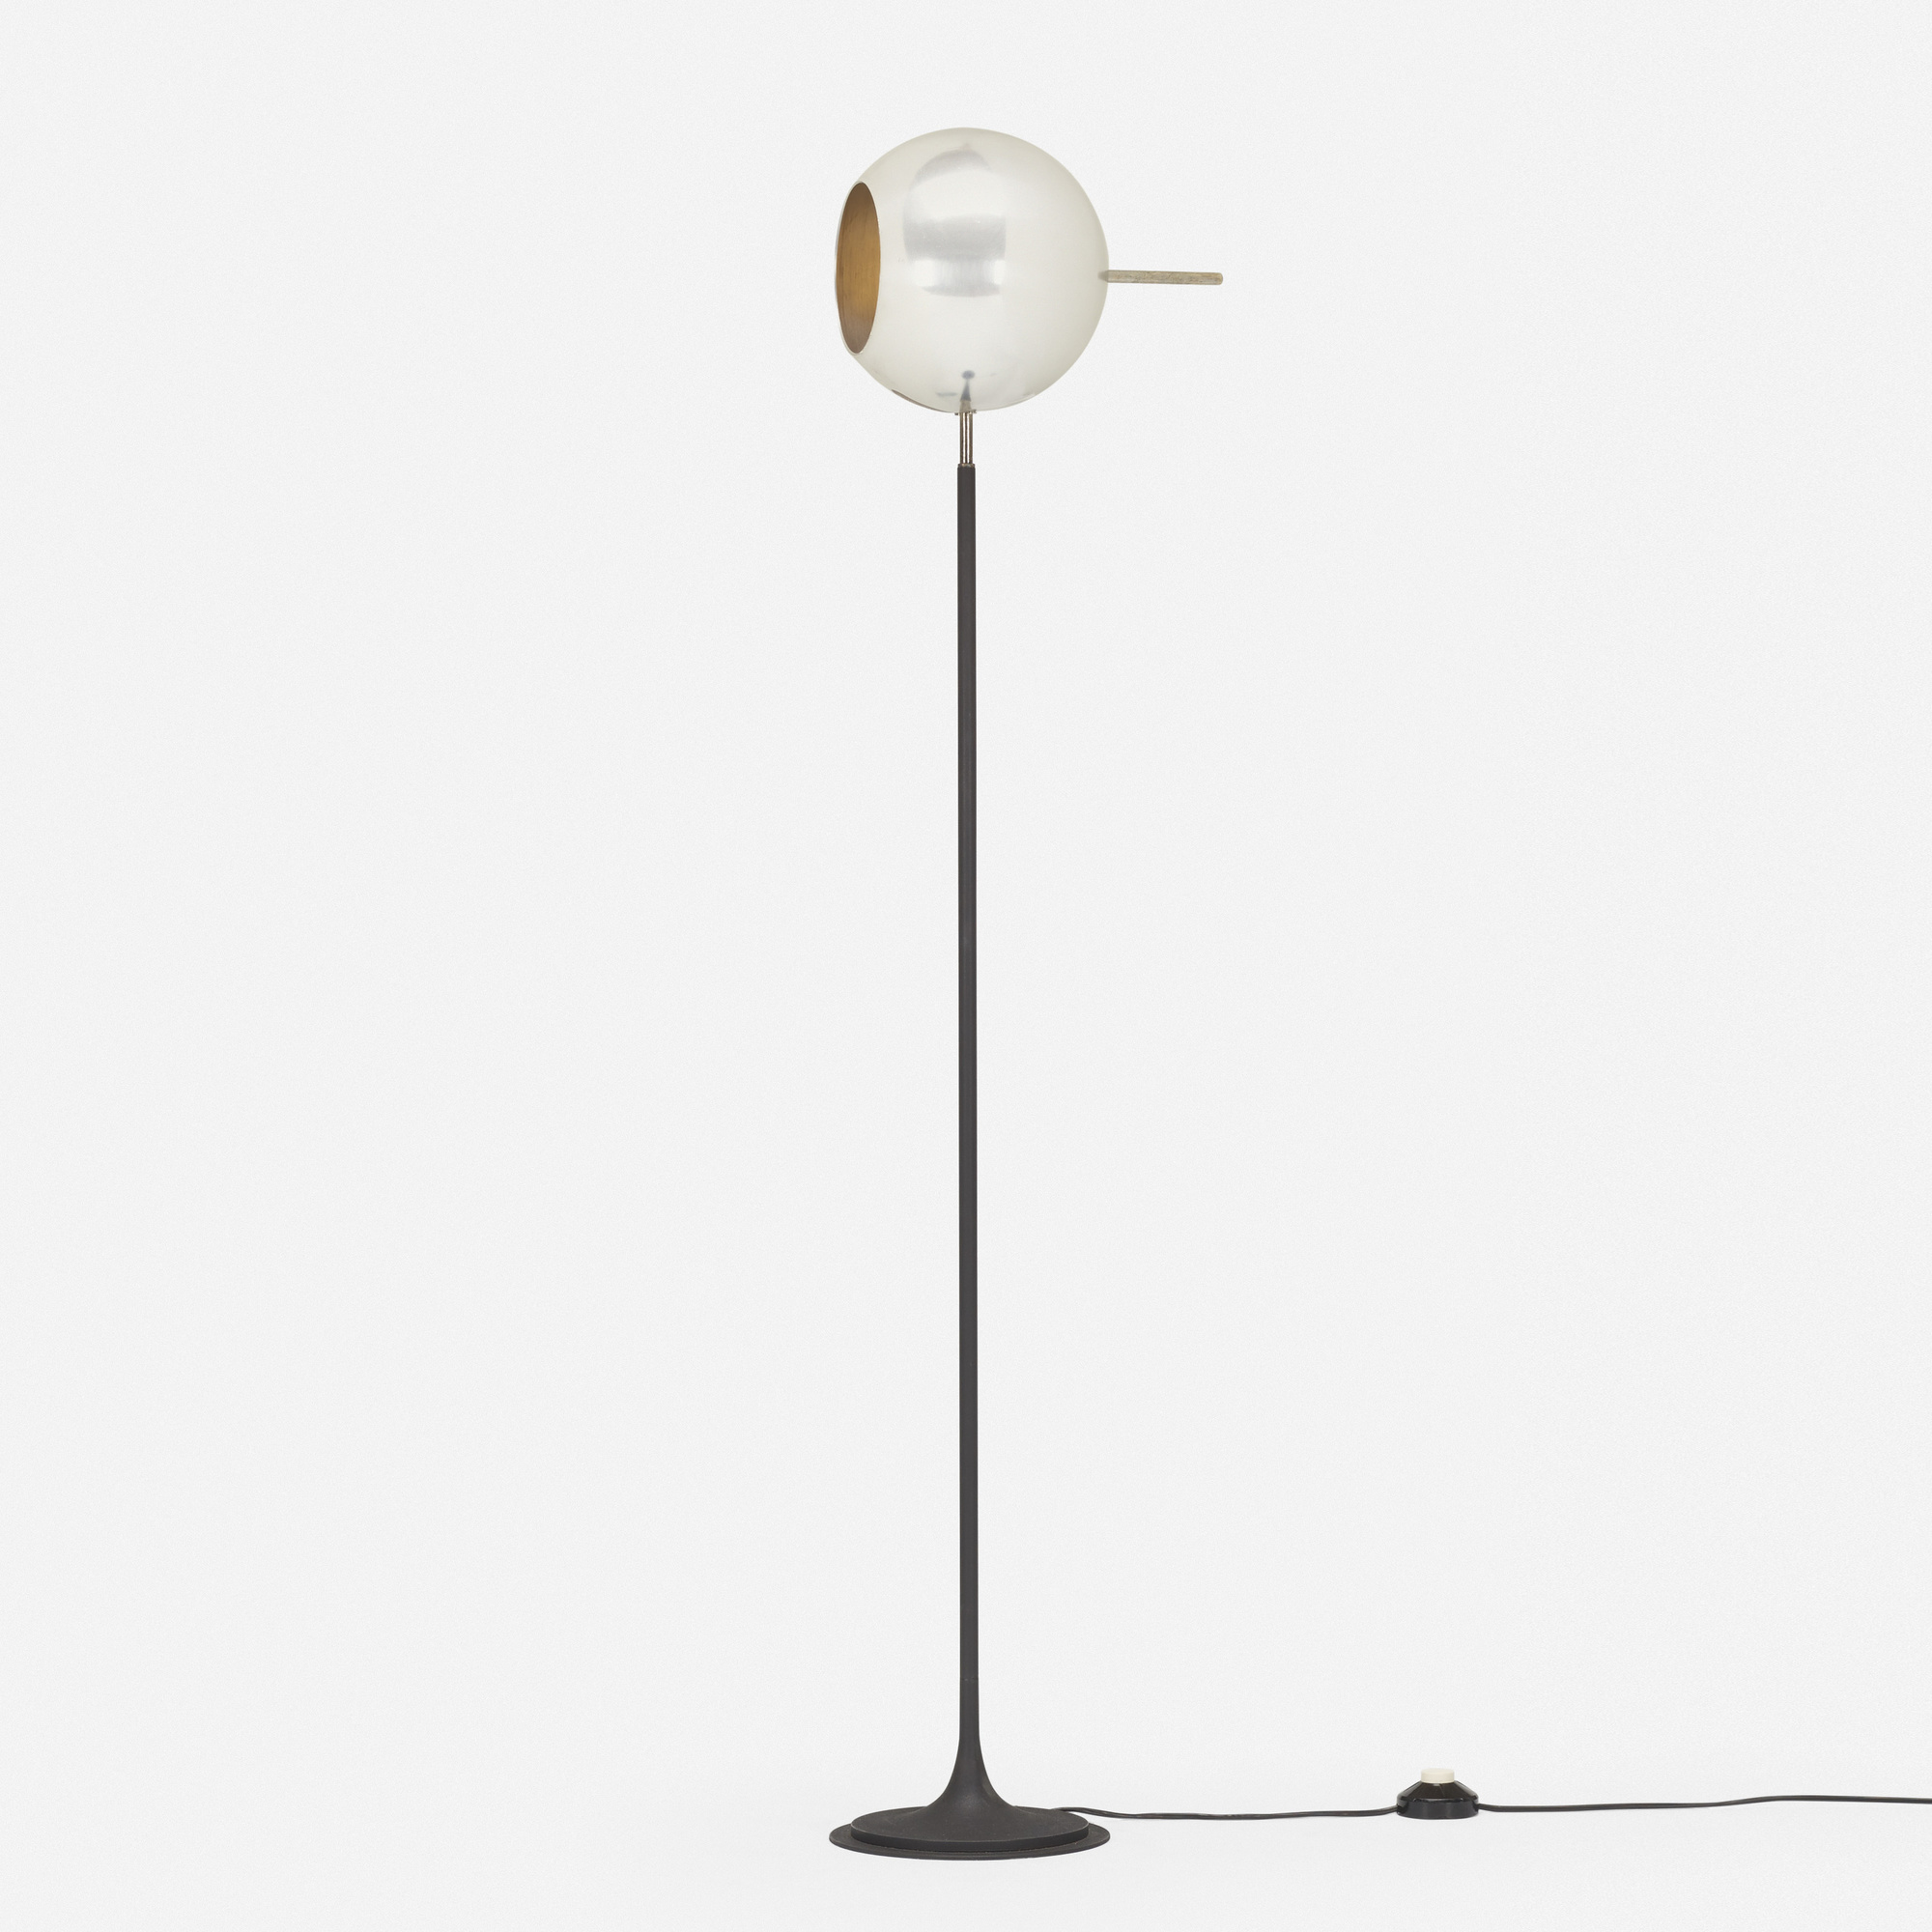 286: Gino Sarfatti / floor lamp, model 1082 N (2 of 3)